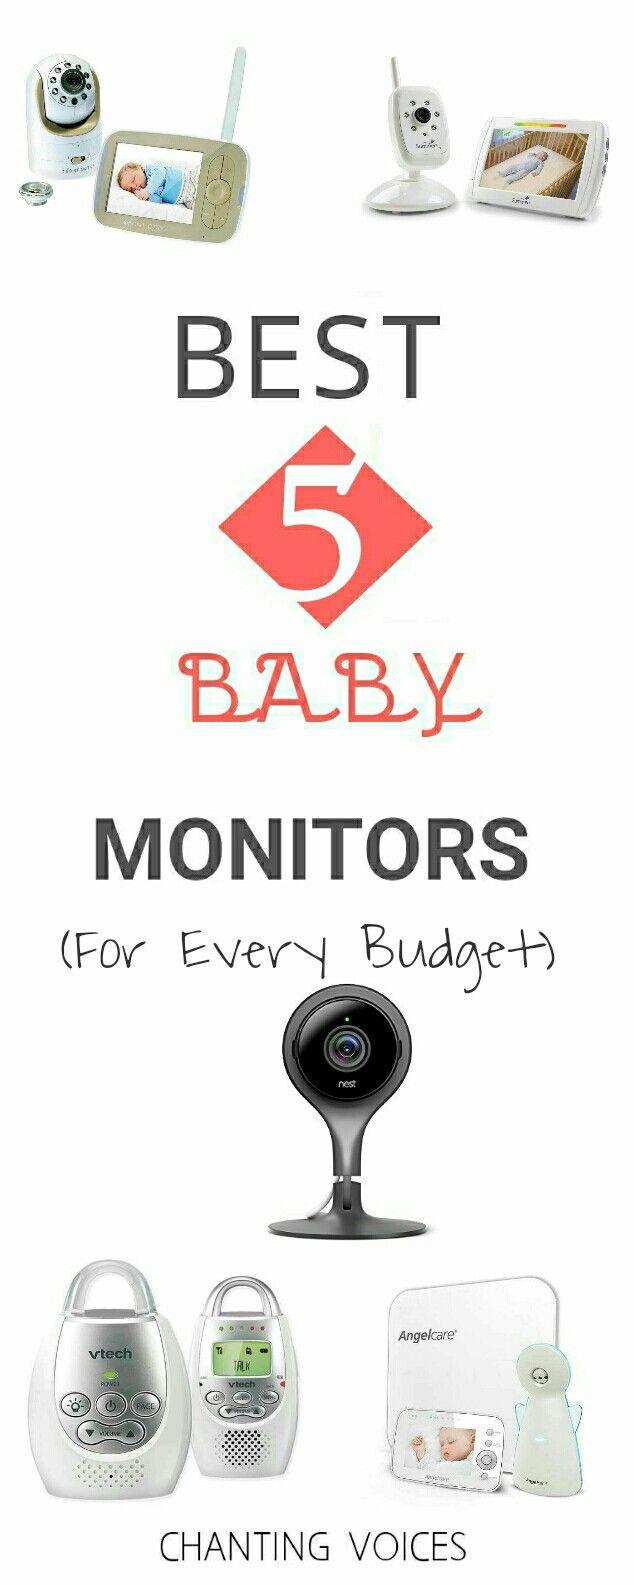 Best baby monitor, best baby monitor 2017, best baby gear, Top 5 best baby monitors, best baby monitor video, best baby monitor iPhone, baby monitors